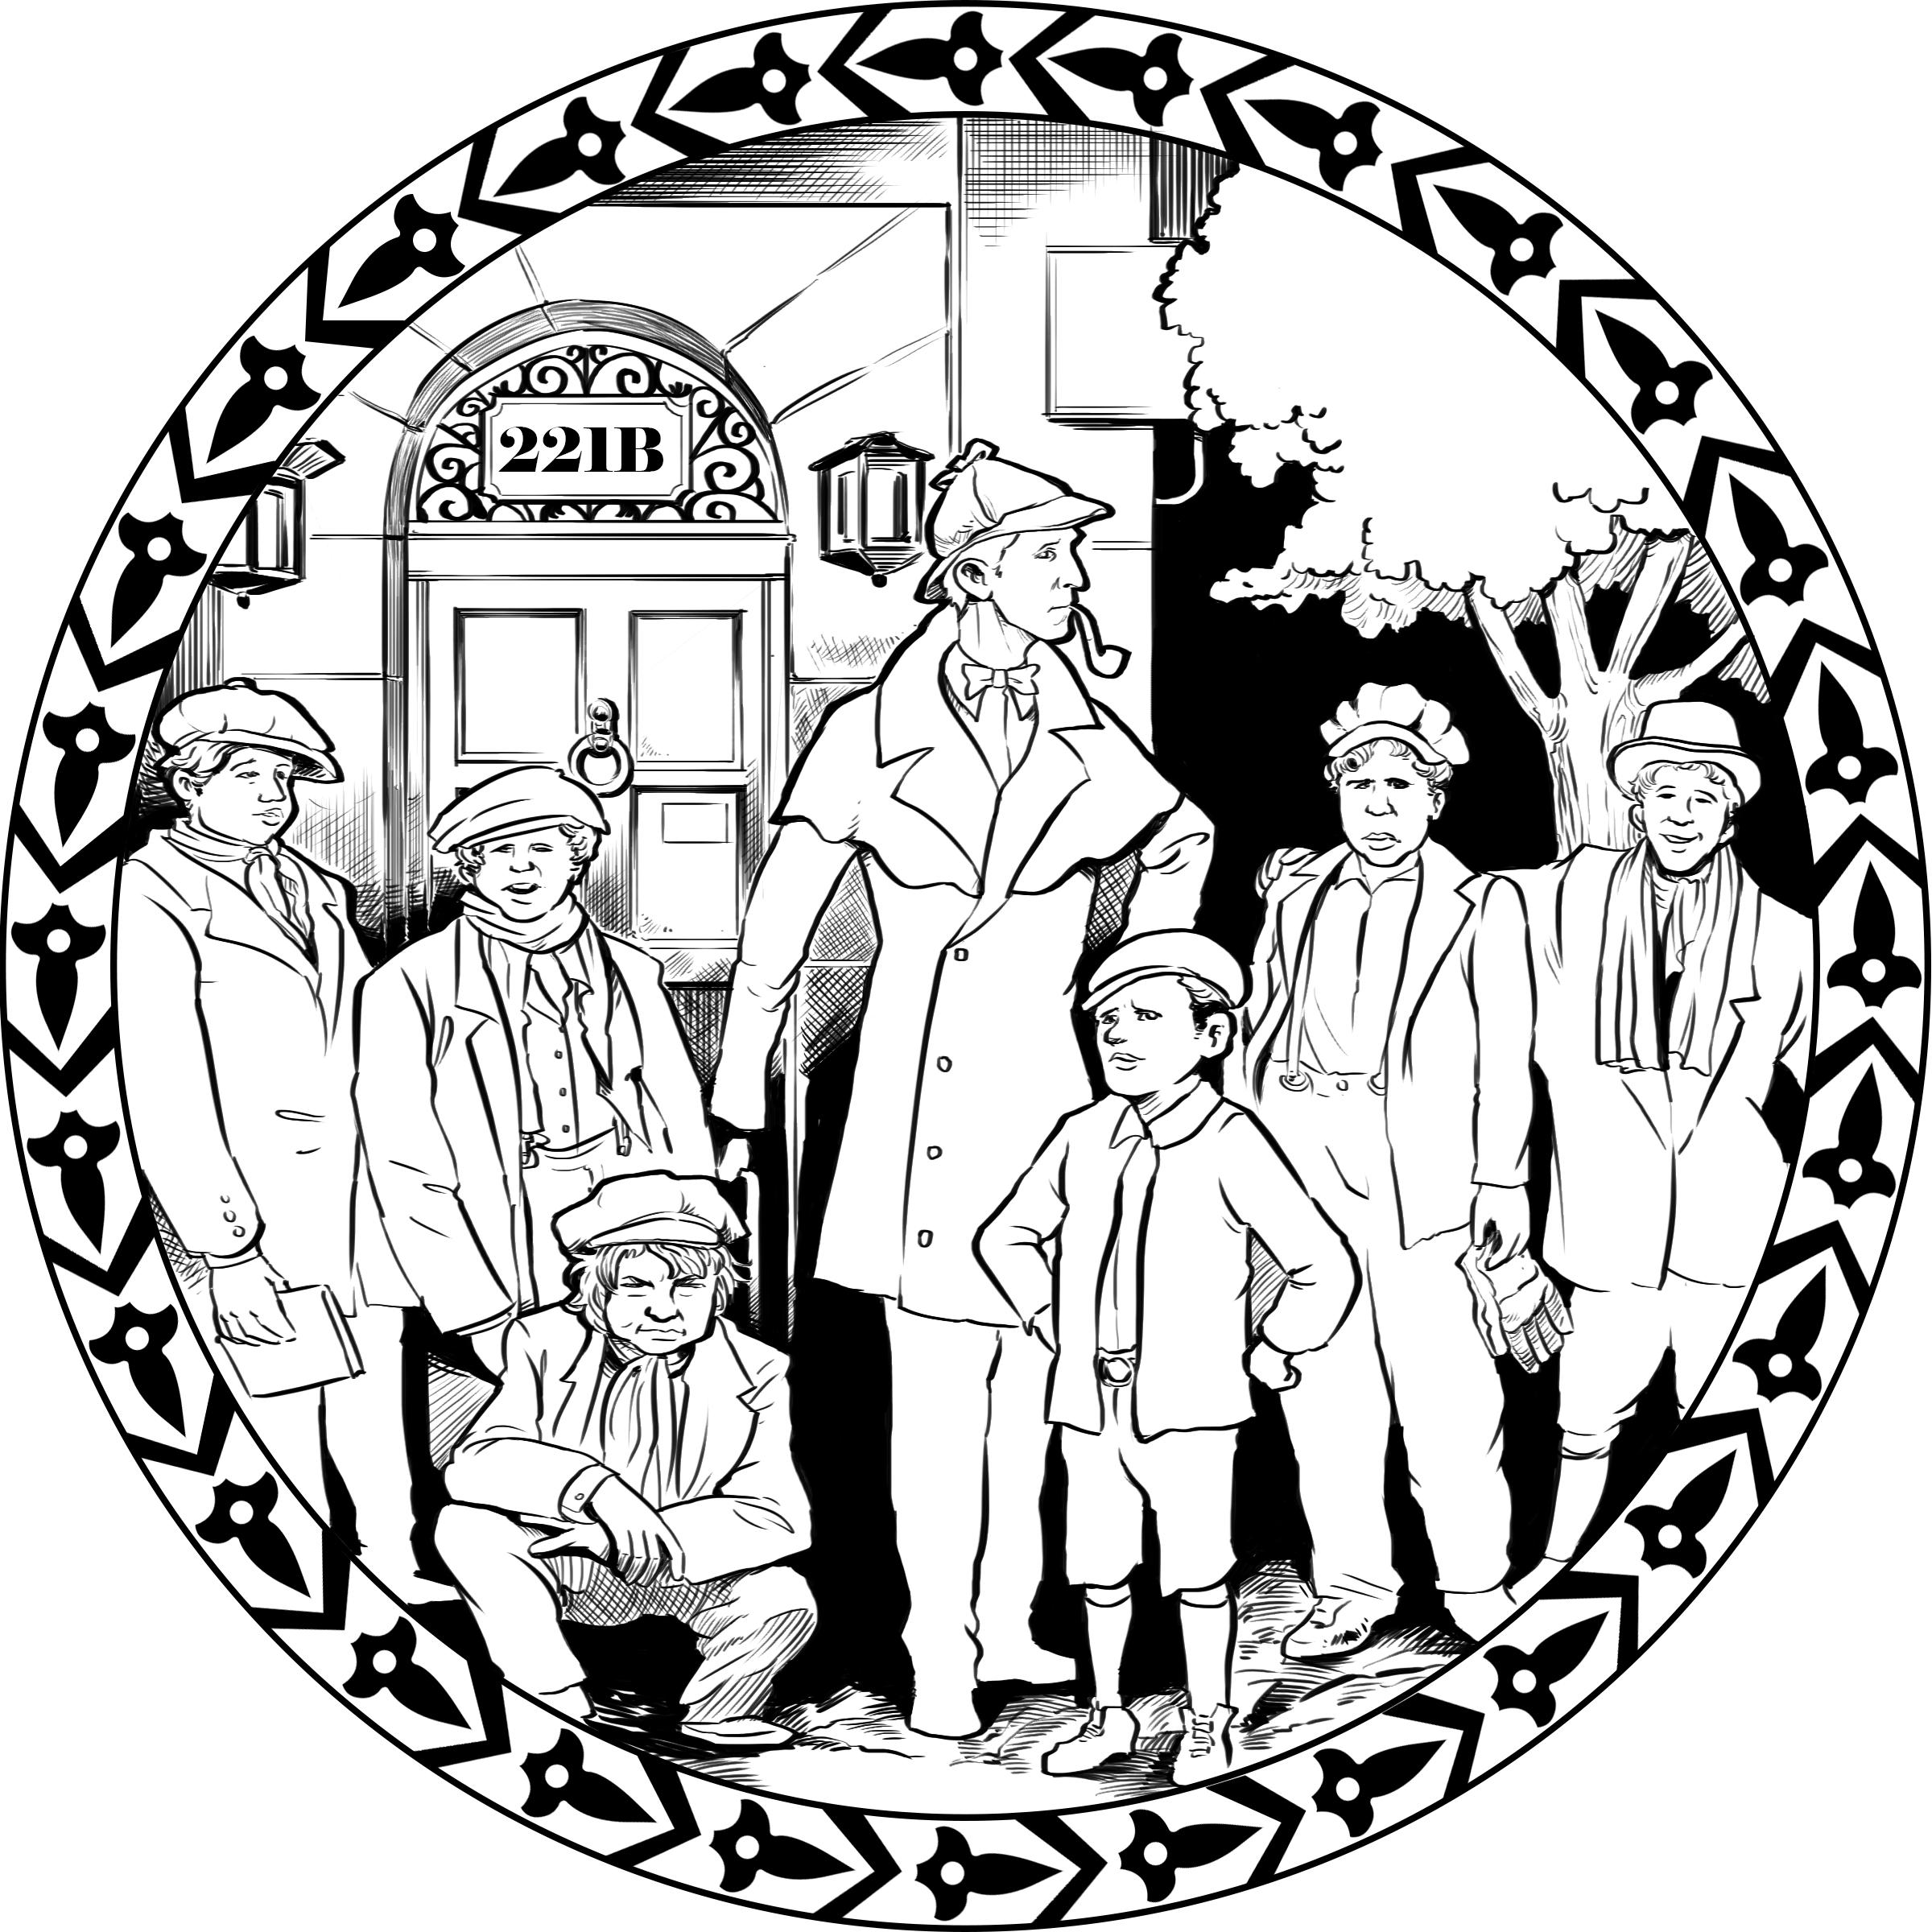 Kickstarter For Sherlockian Game to Feature Medal